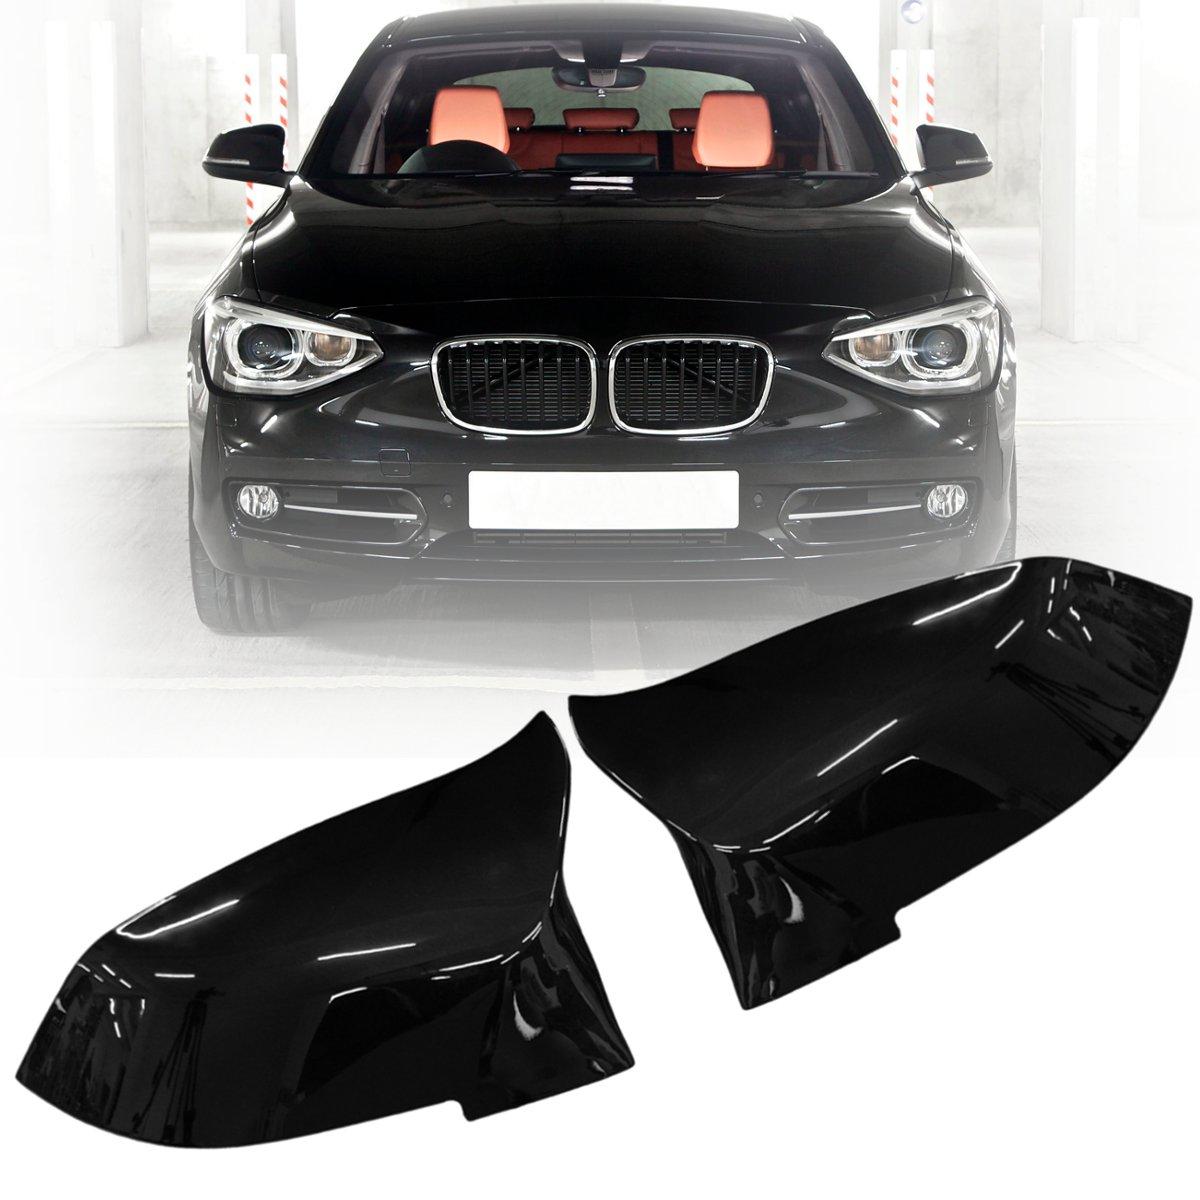 4 цвета пара черный глянец Зеркало заднего вида Обложка для BMW F20 F21 F22 F30 F32 F36 X1 F87 M3 2012 2013 2014 2015 2016 2017